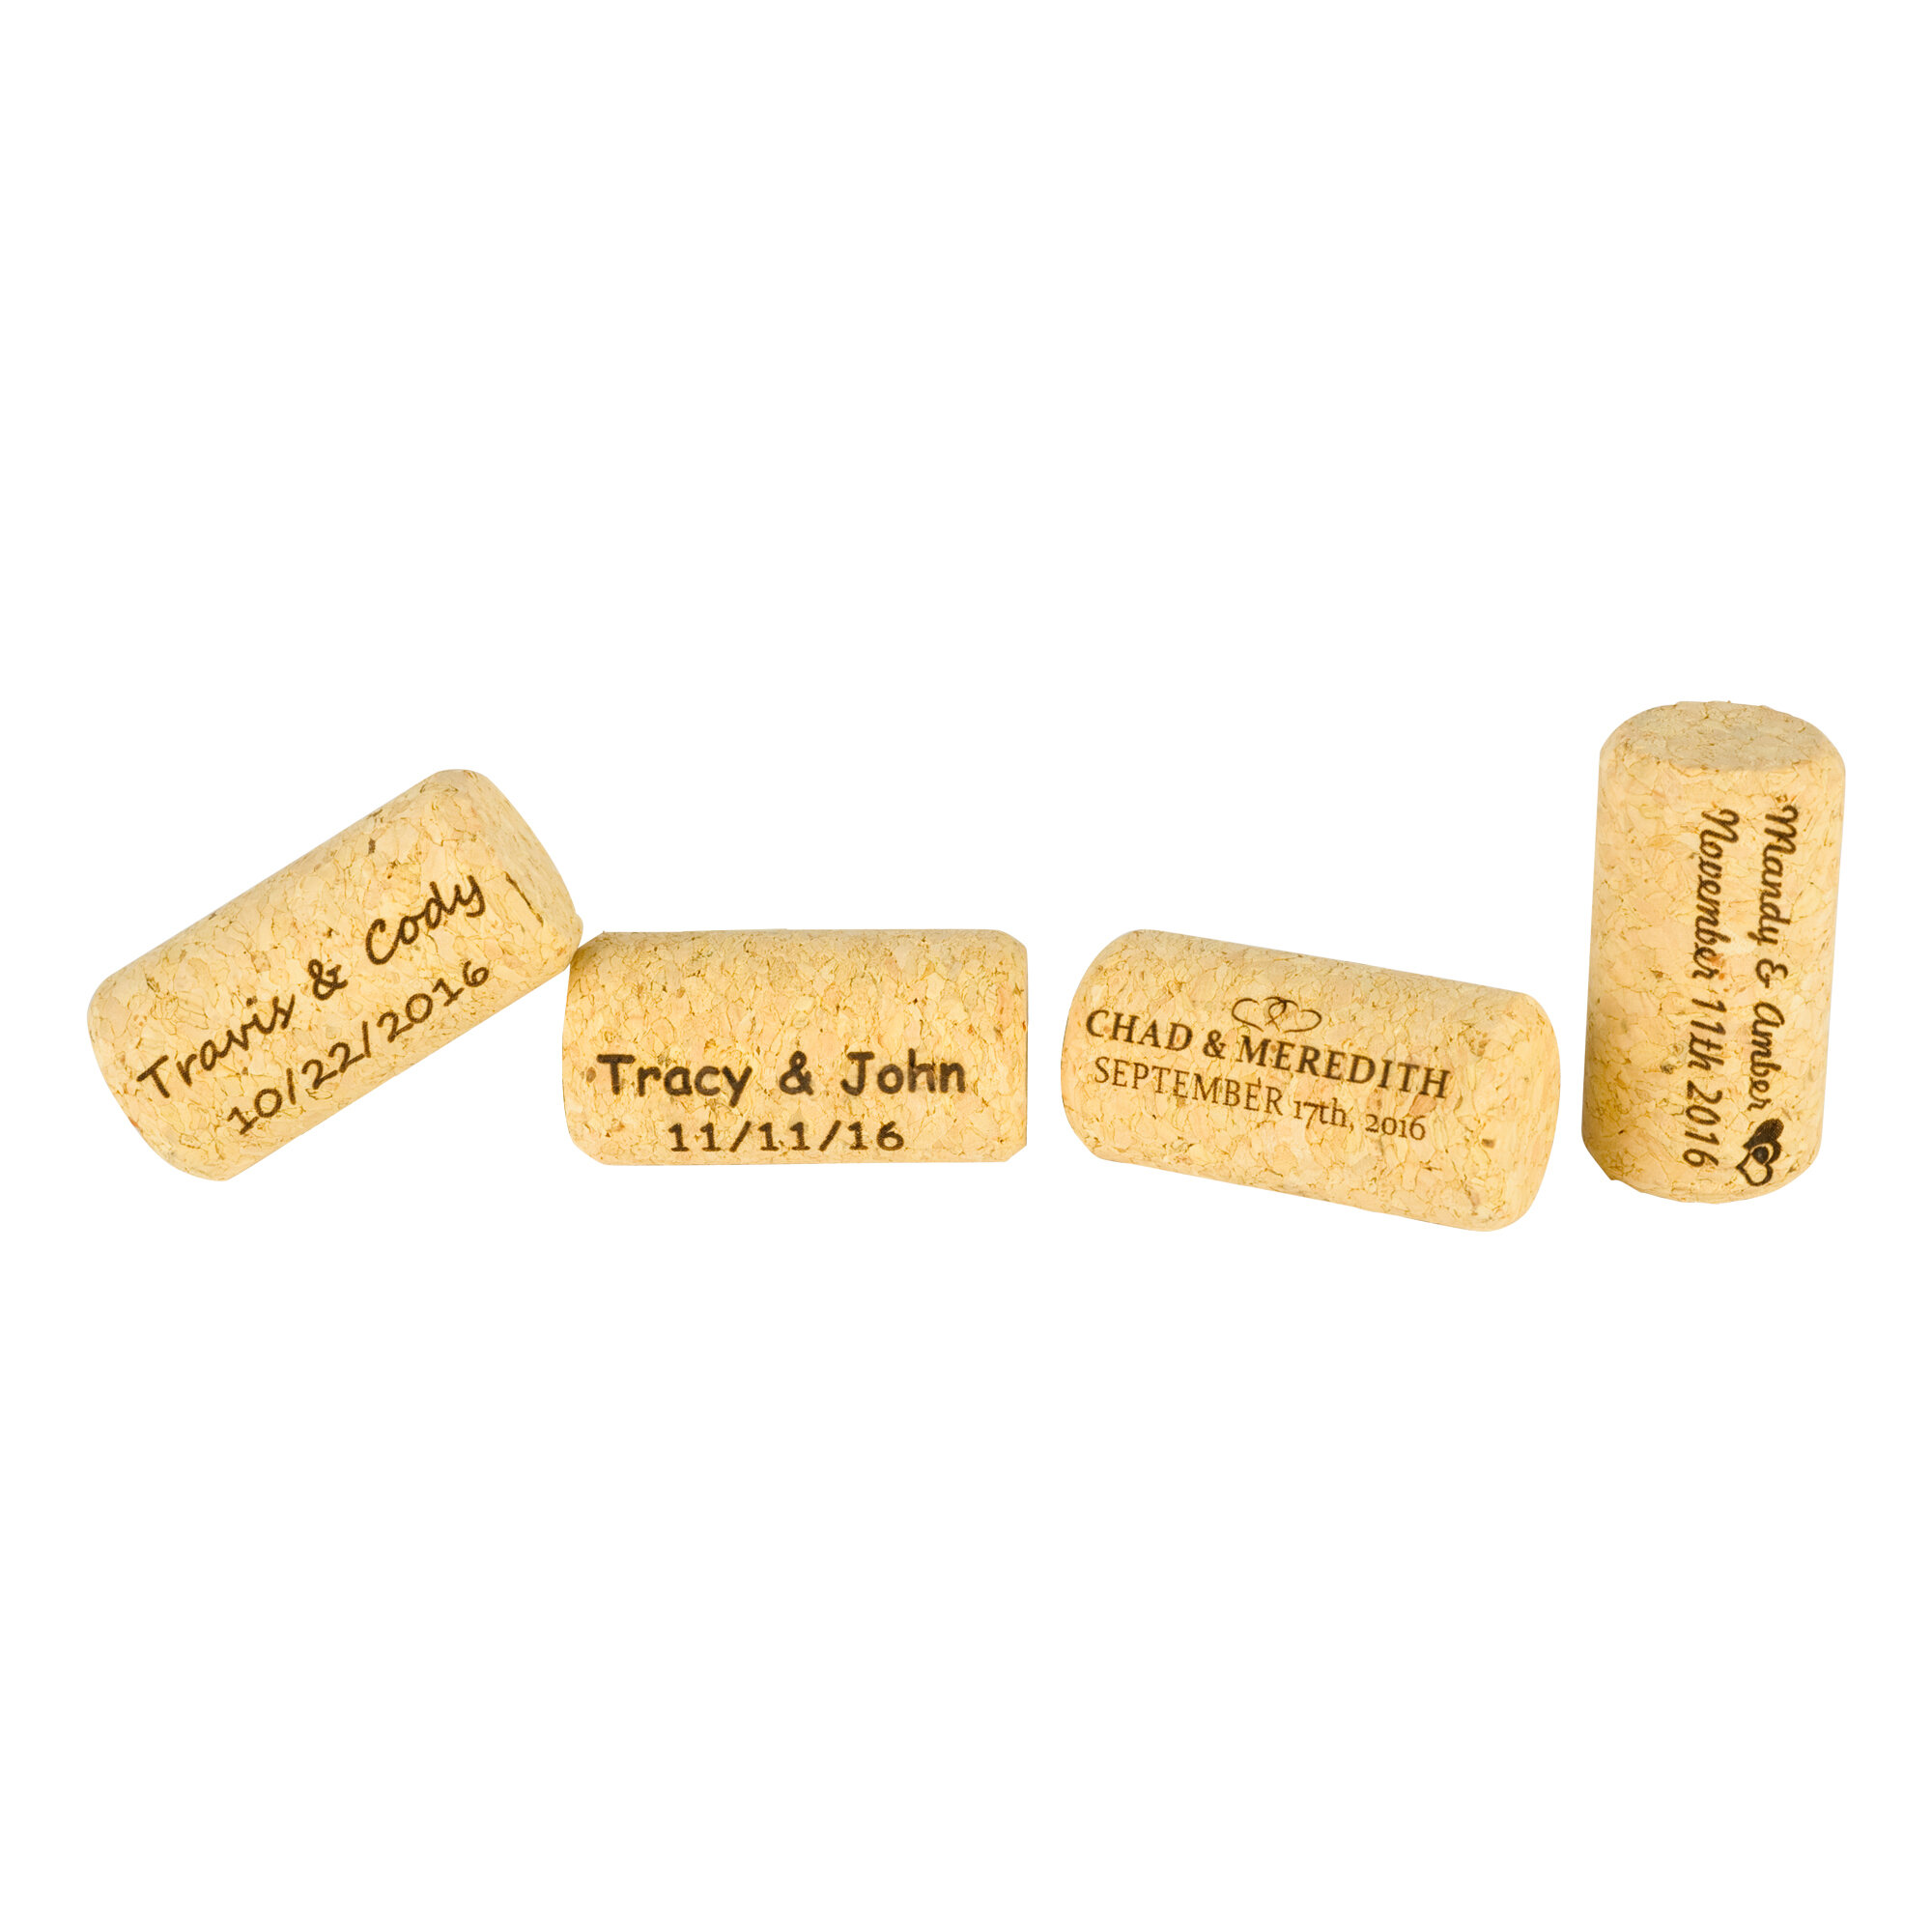 jelinek-cork-engraved-wine-corks.jpg